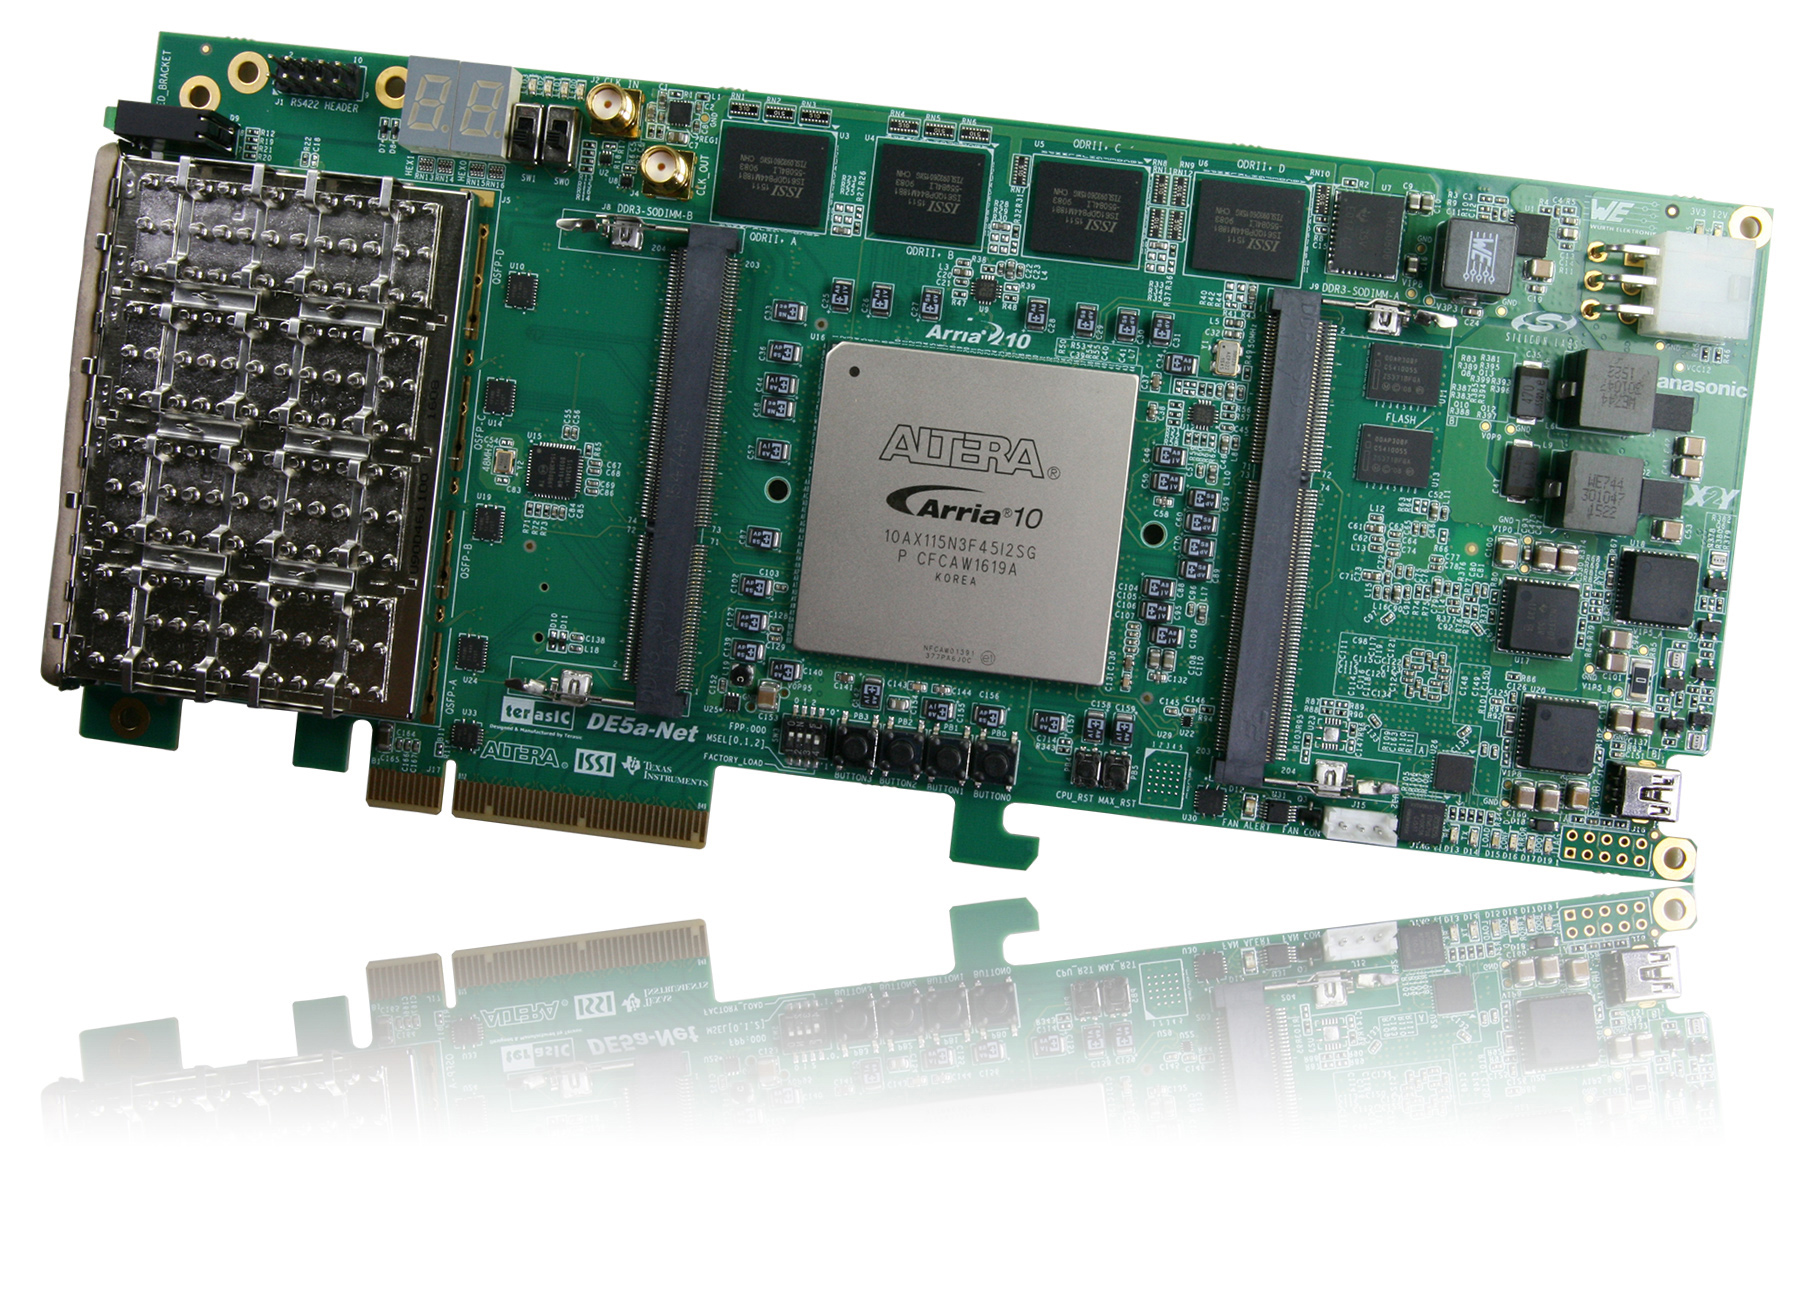 DE5a-Net Arria 10 FPGA Development Kit